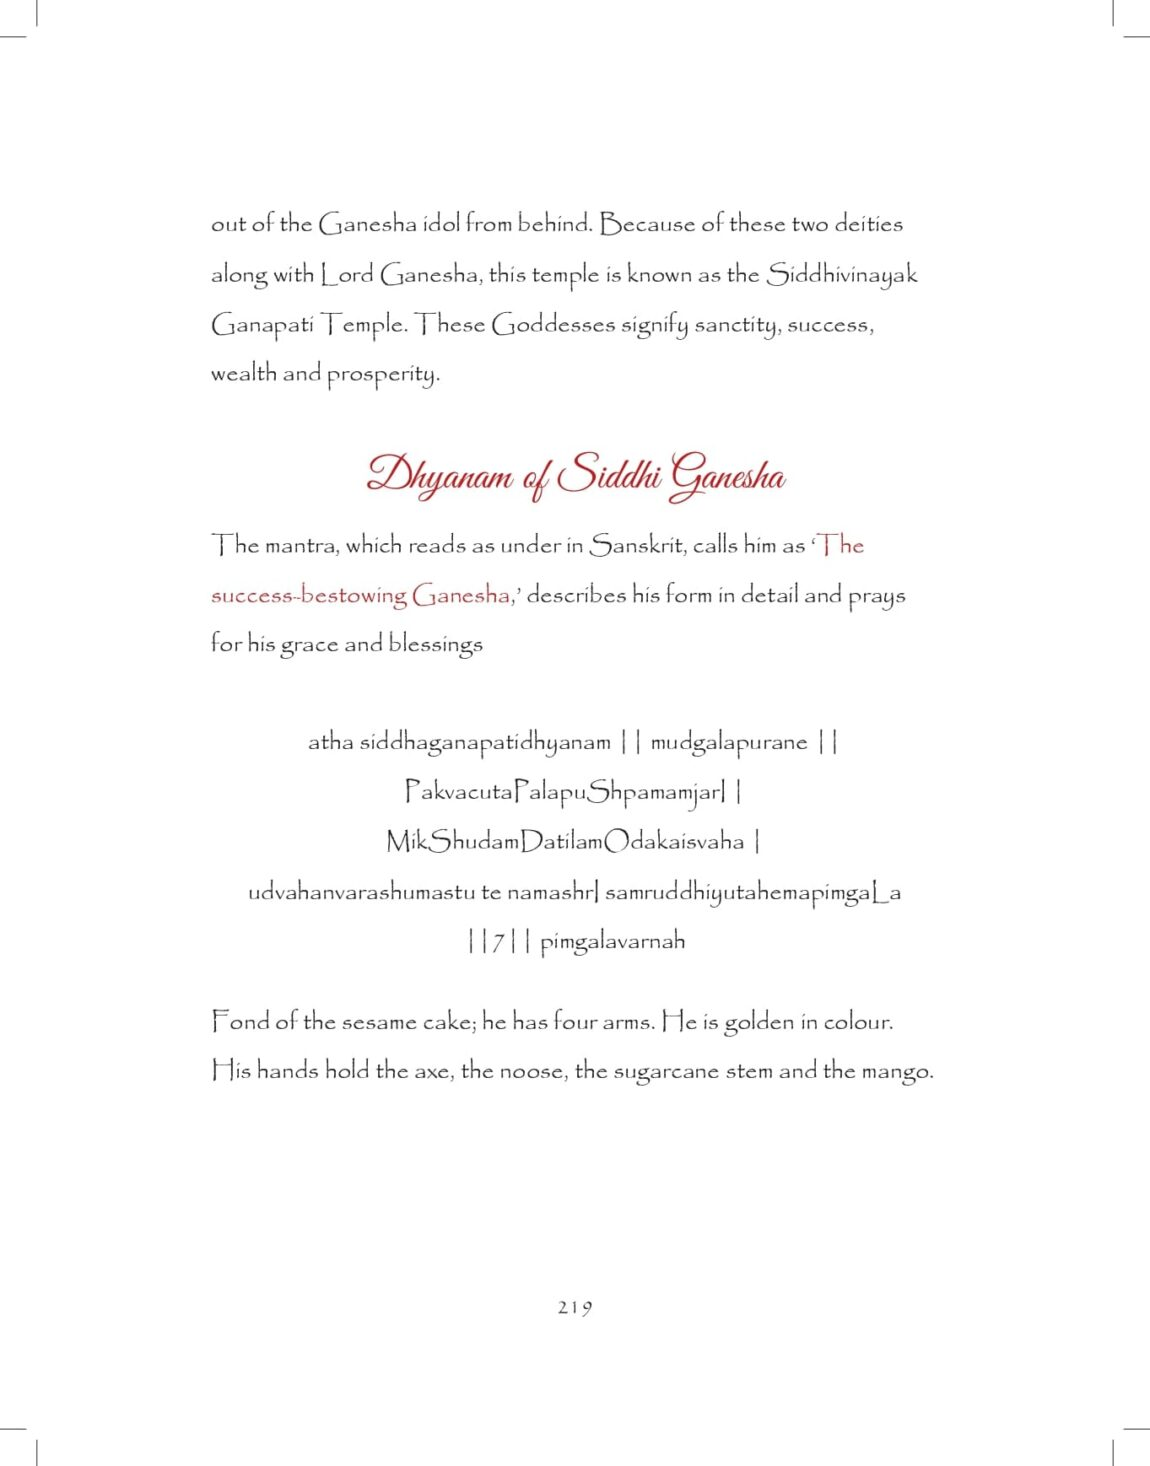 Ganesh-print_pages-to-jpg-0219.jpg